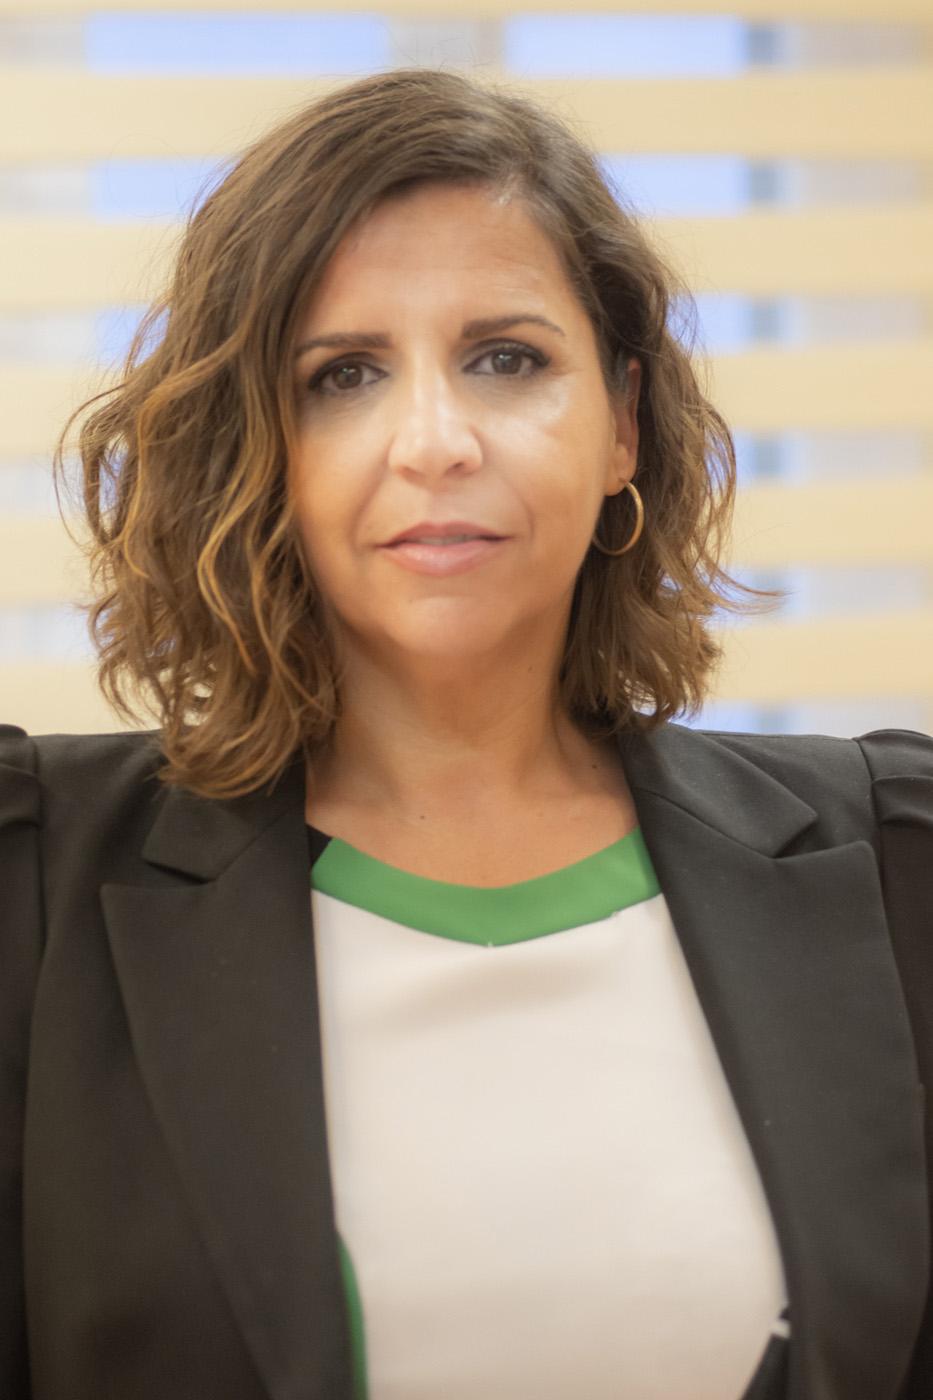 Lourdes Orta Rodríguez